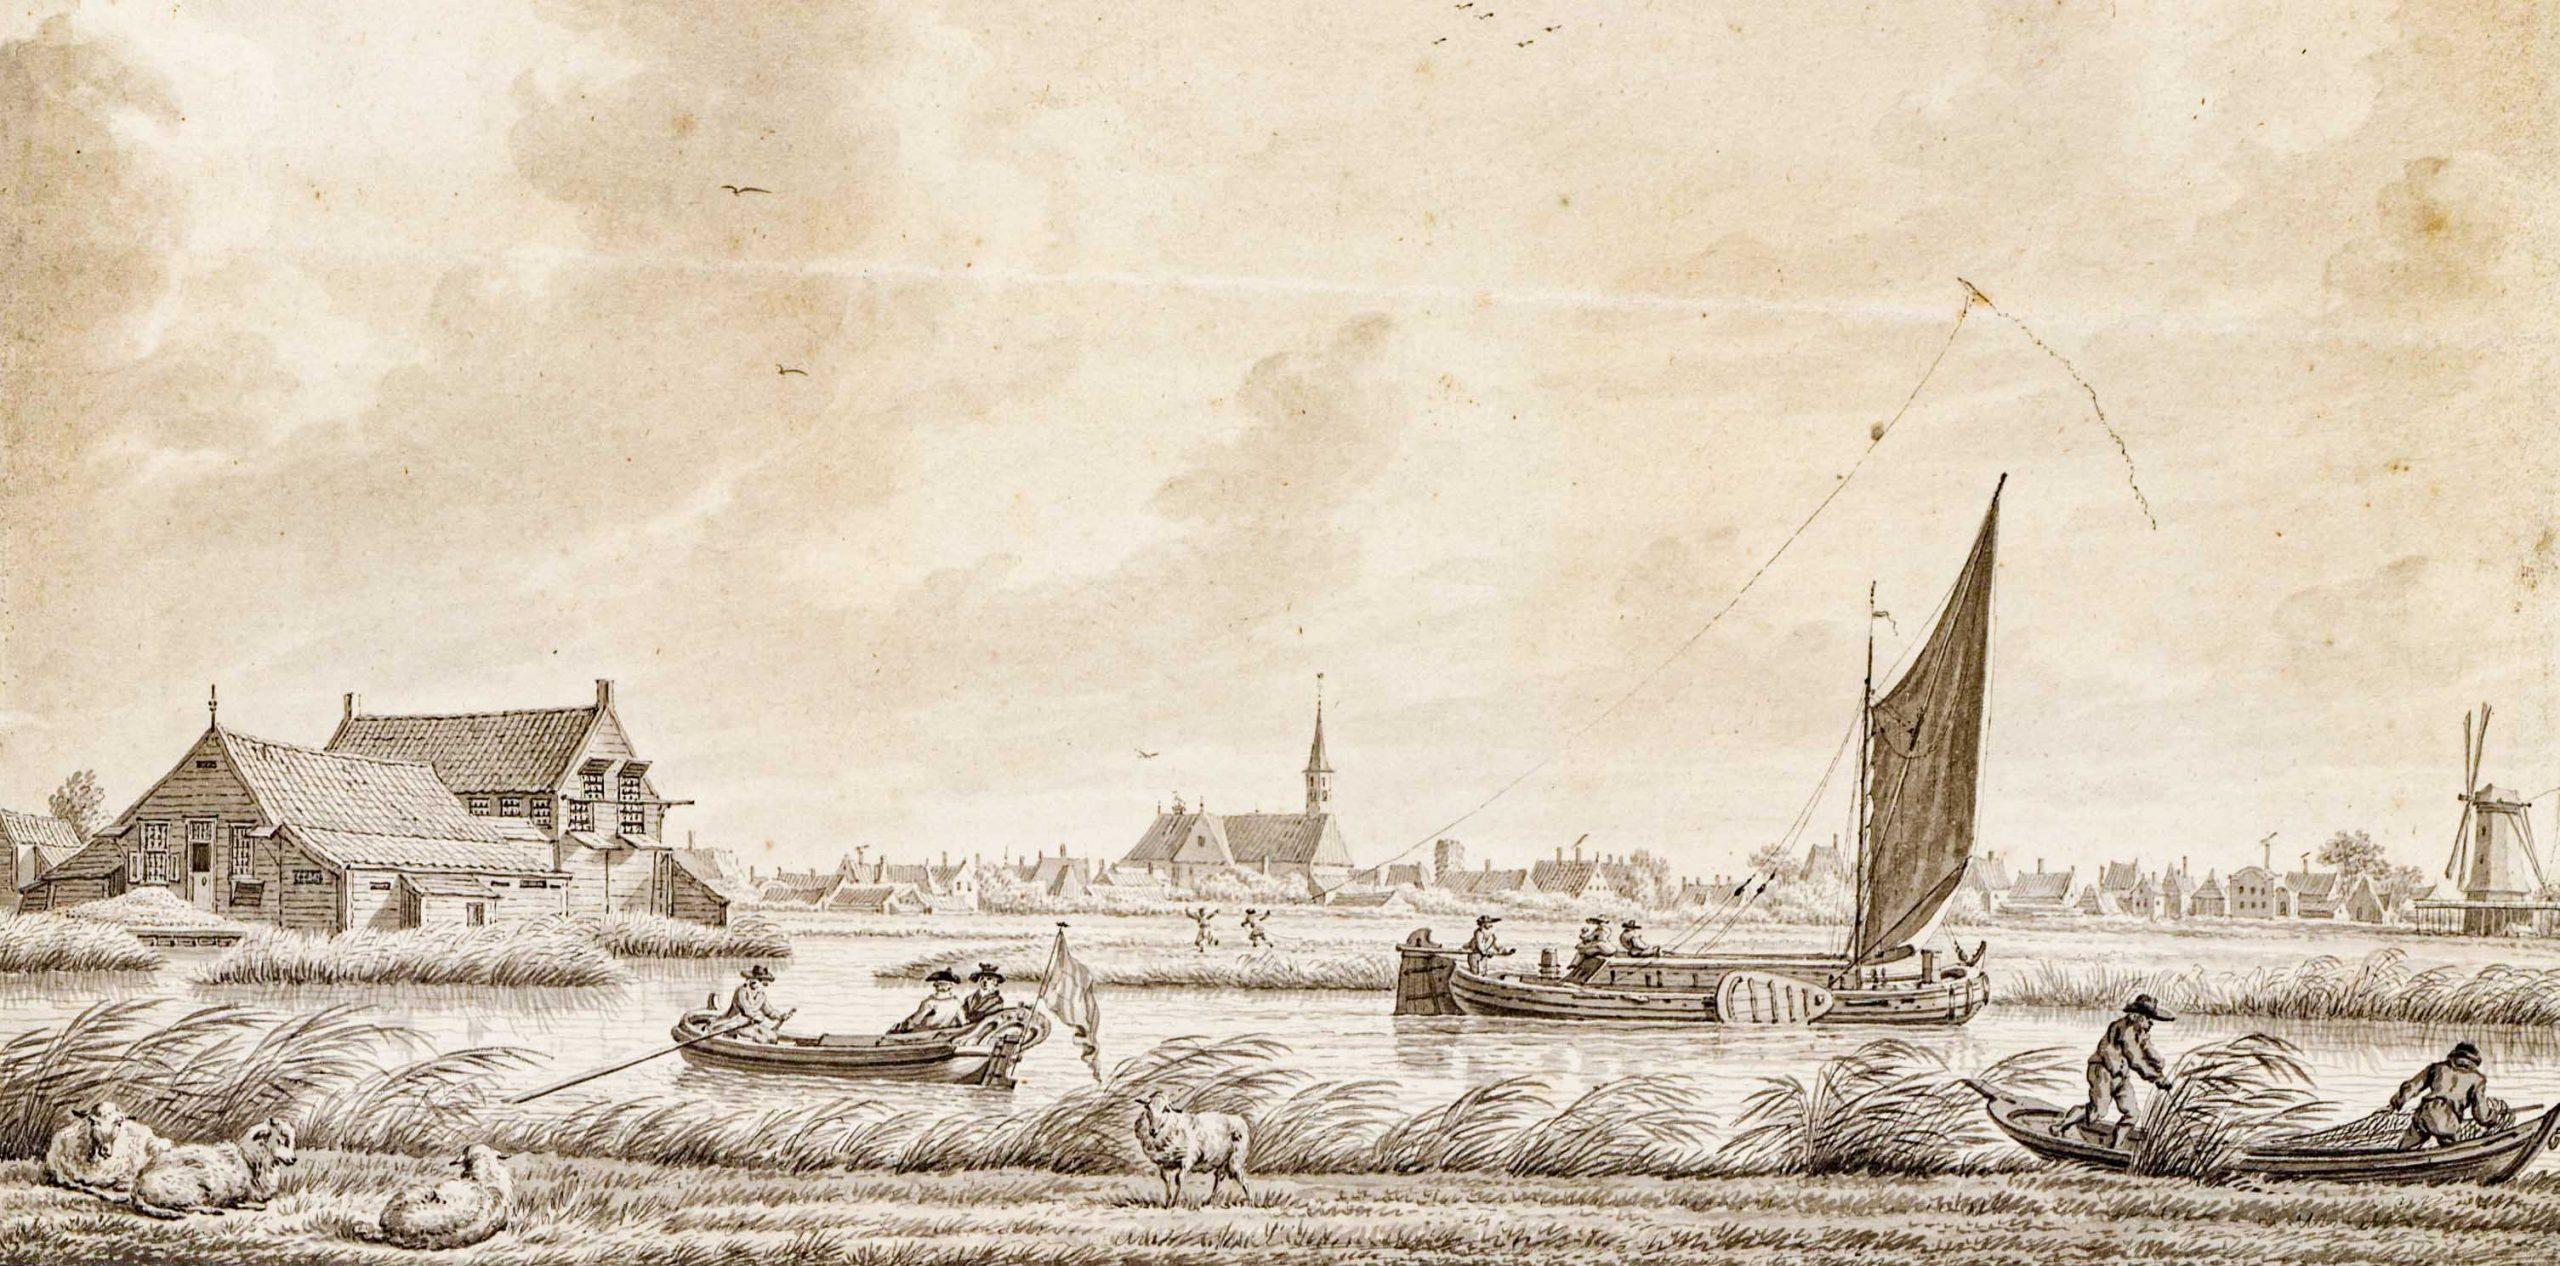 Tekening Oostzanerveld richting kerk, circa 1794